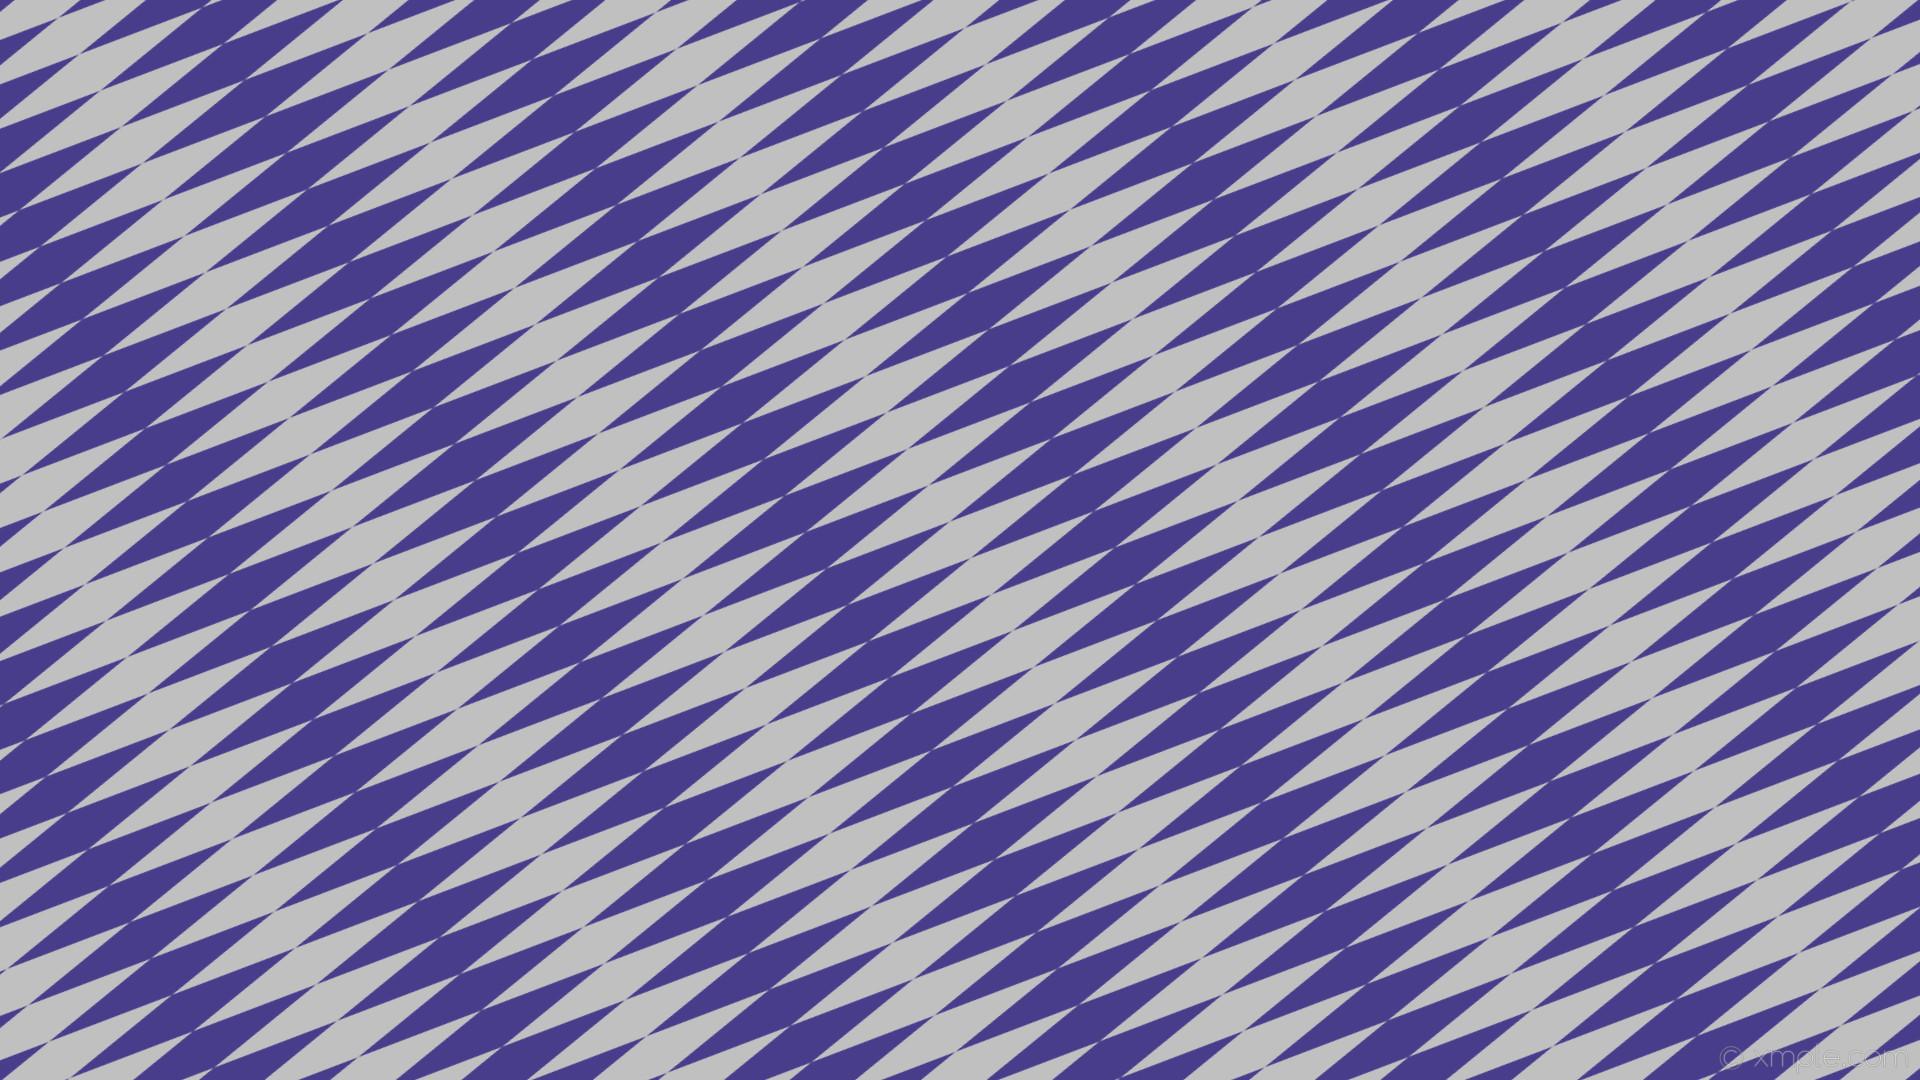 wallpaper diamond lozenge rhombus purple grey silver dark slate blue  #c0c0c0 #483d8b 30°